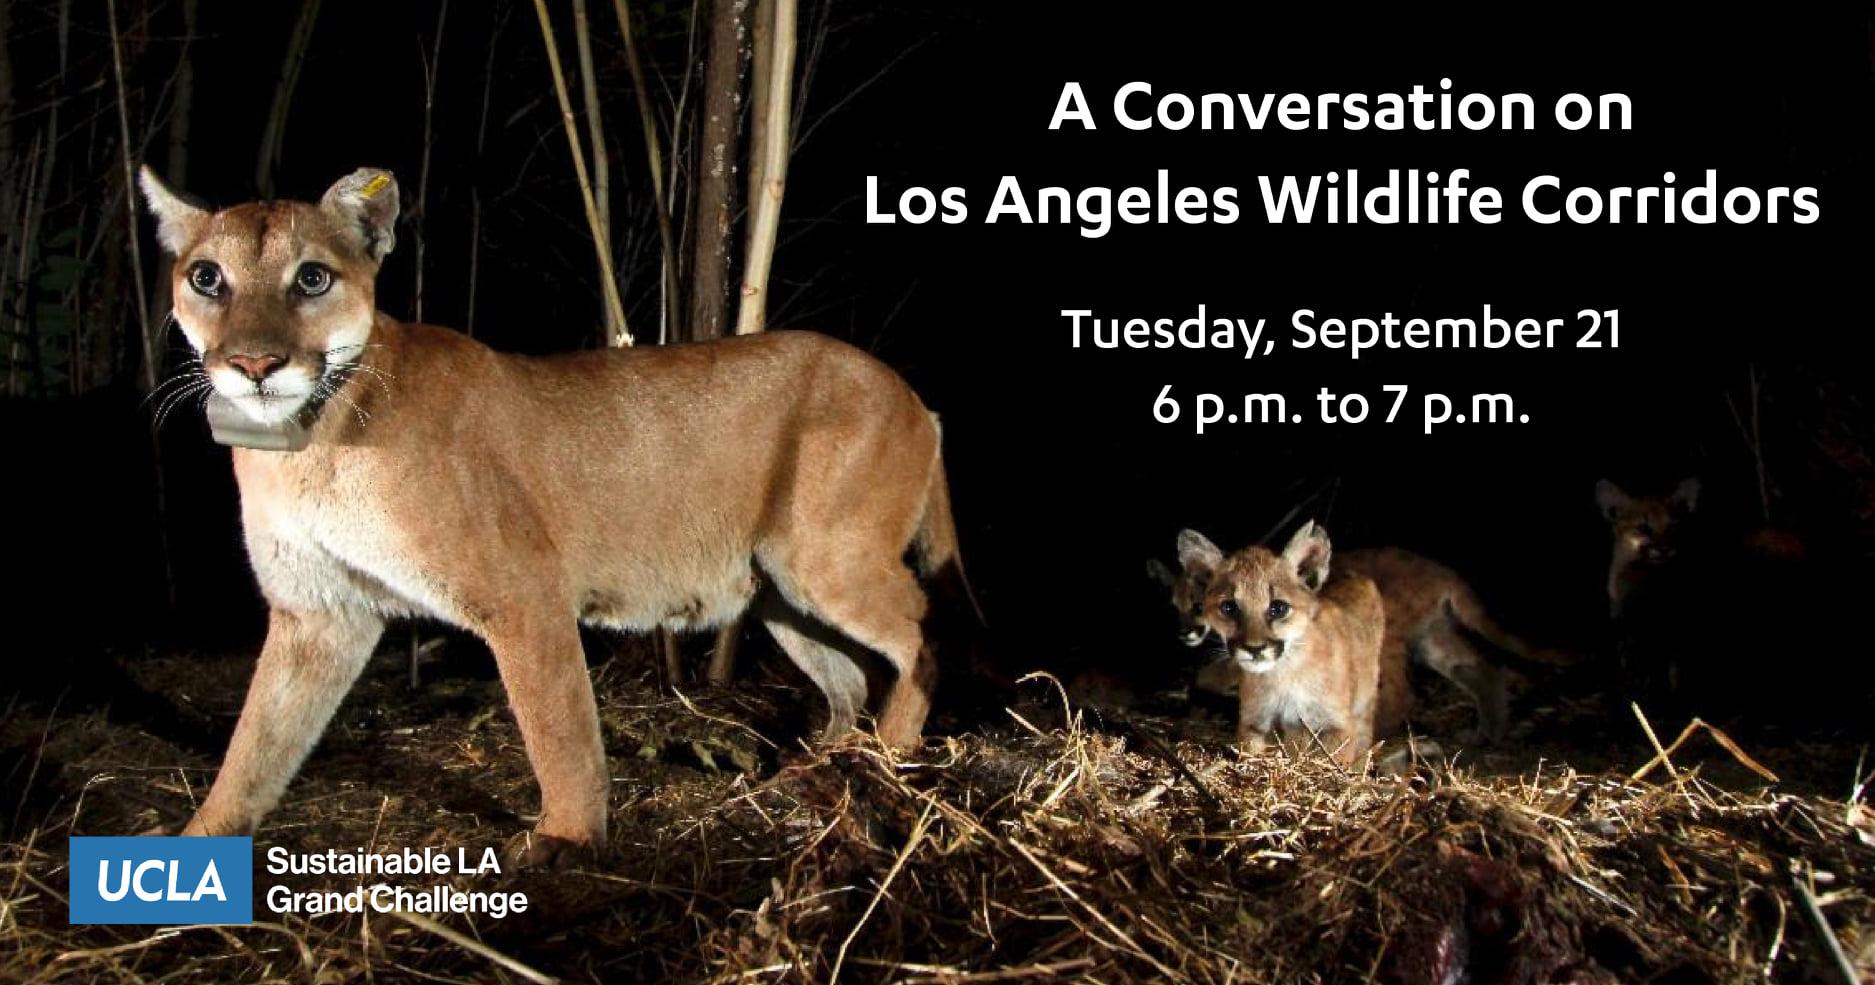 UCLA Sustainable LA Grand Challenge – A Conversation on Los Angeles Wildlife Corridors